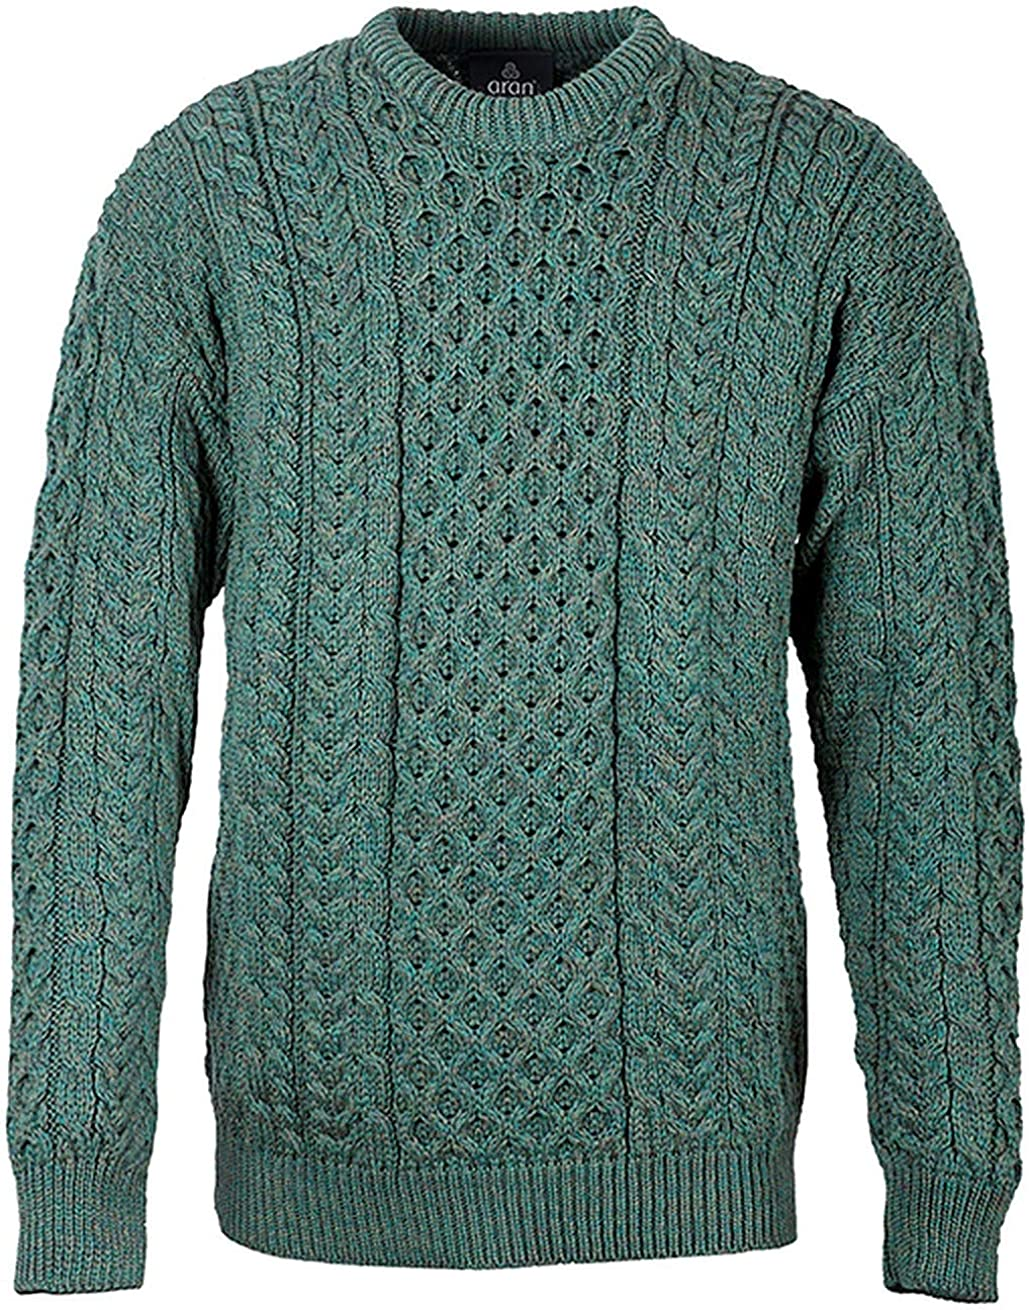 Carraig Donn Mens Irish Traditional Aran Wool Pullover Sweater X-Large, Connemara Green